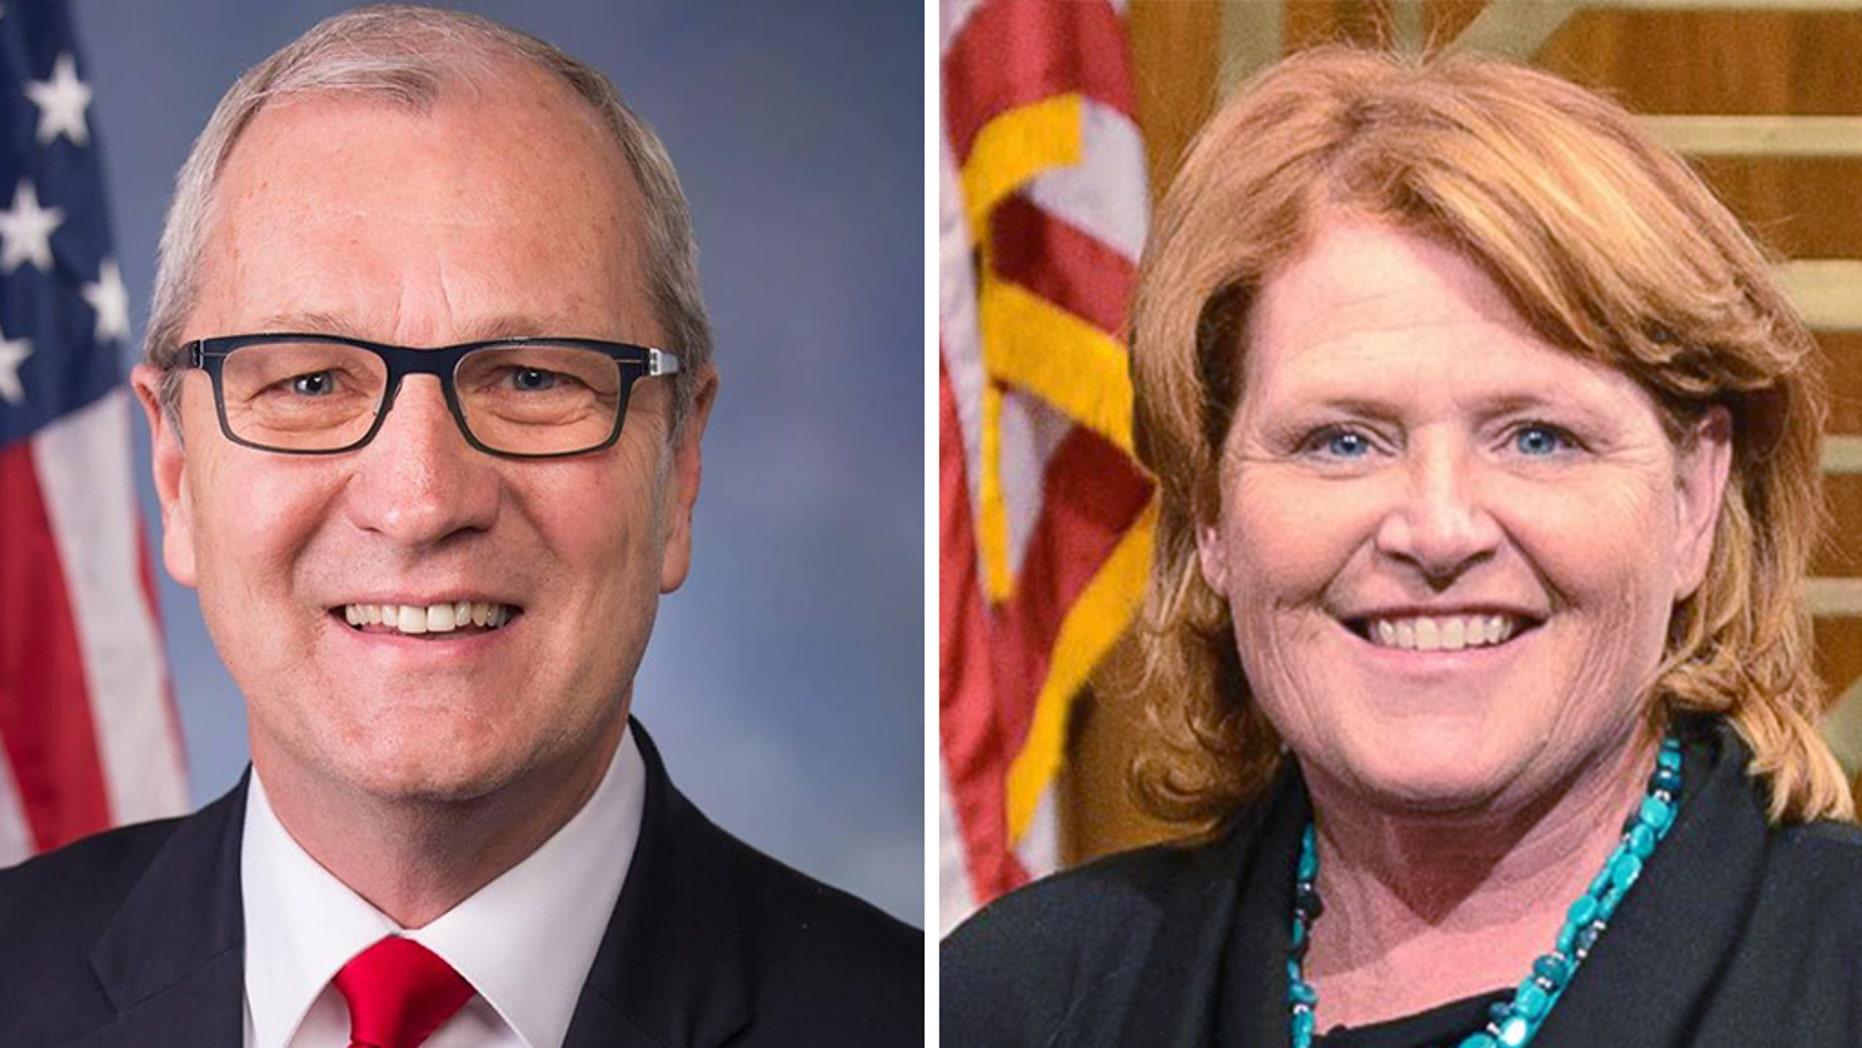 Rep. Kevin Cramer, R-N.D., slammed his opponent, incumbent Democrat Sen. Heidi Heitkamp, for her stance on late-term abortions.